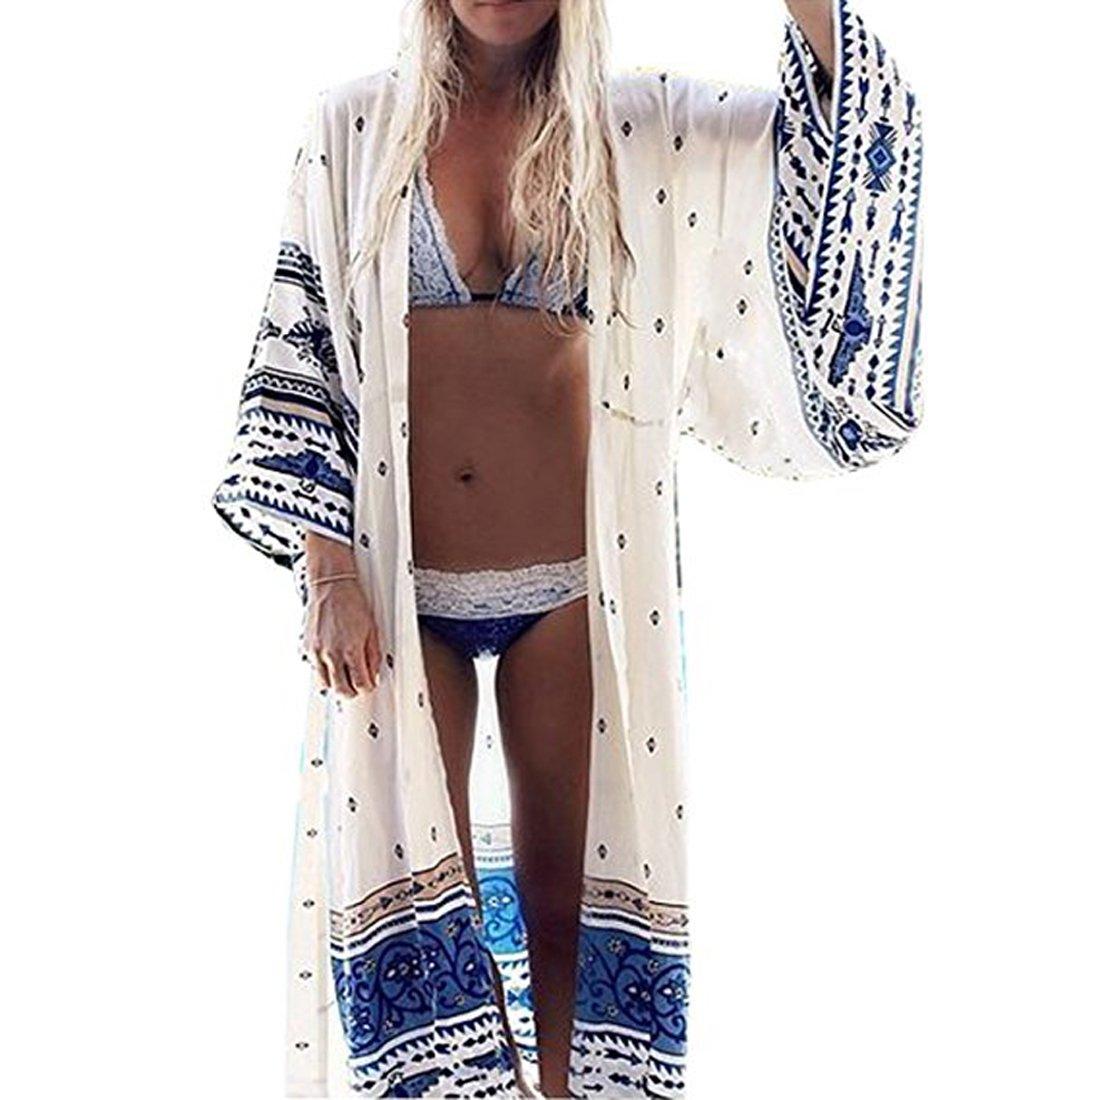 d160b3f5cc Womens Loose Kimono Maxi Cardigan Beach Dress Bikini Cover Up White and  Blue One Size at Amazon Women s Clothing store